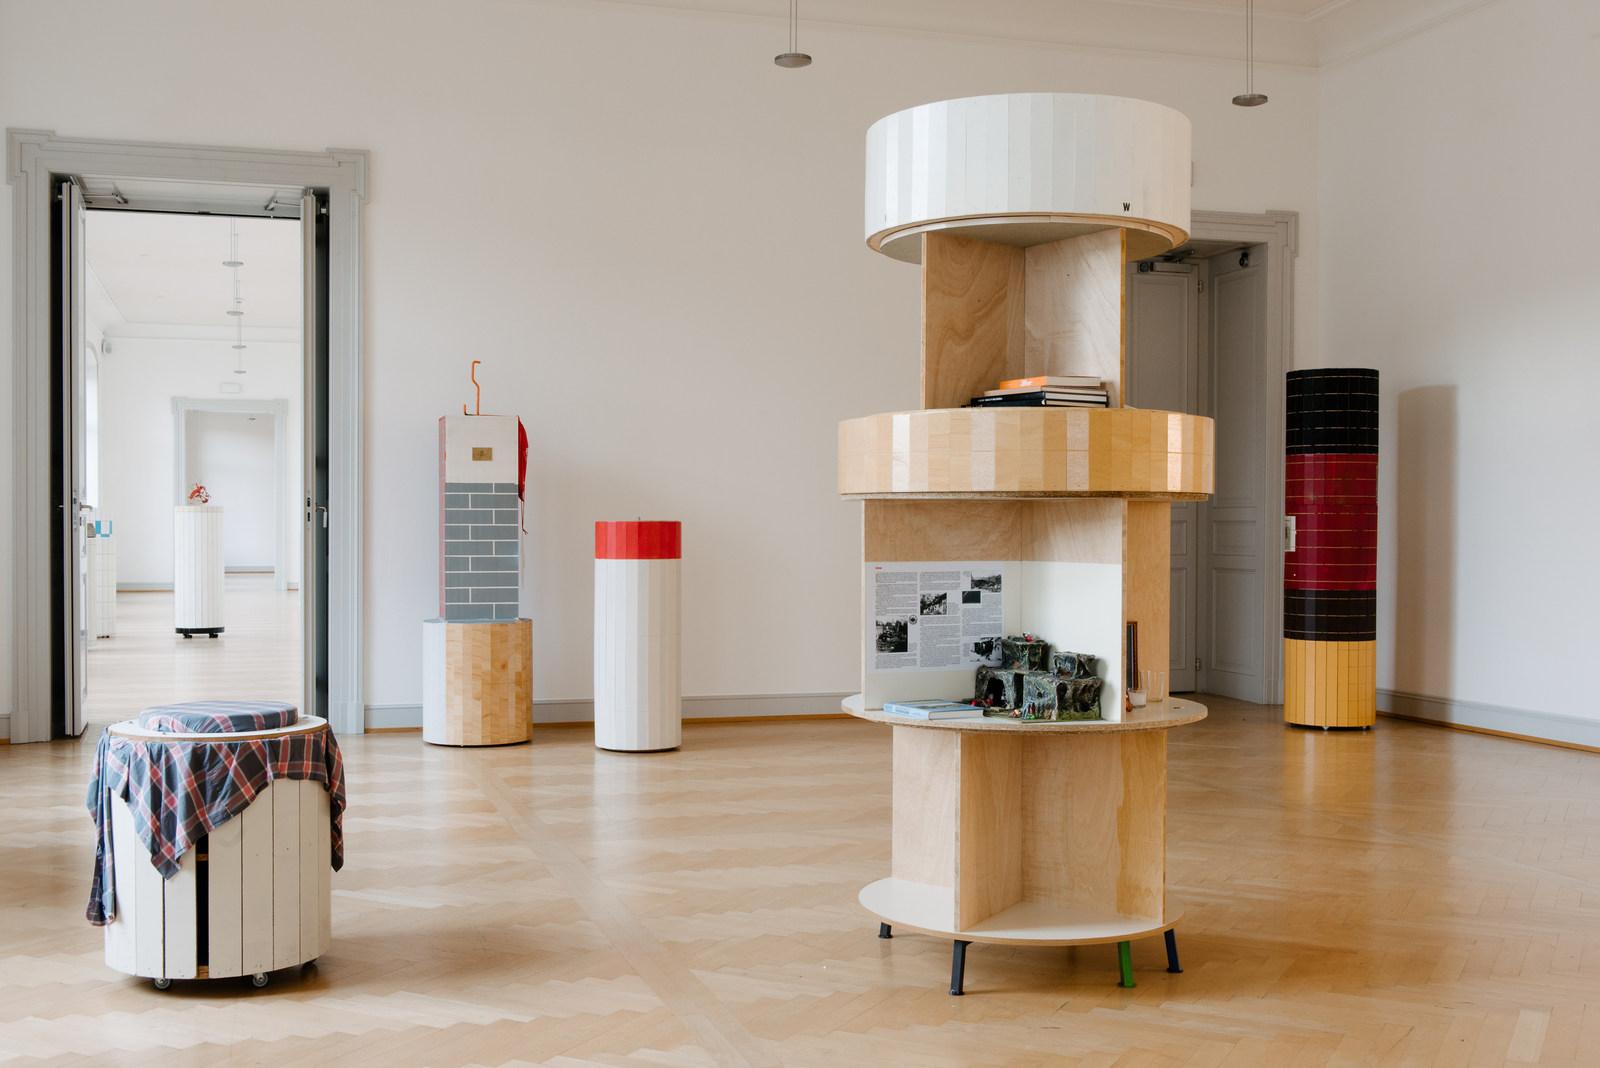 04_Installationsansicht_St.Gallen__Foto_Sebastian_Stadler